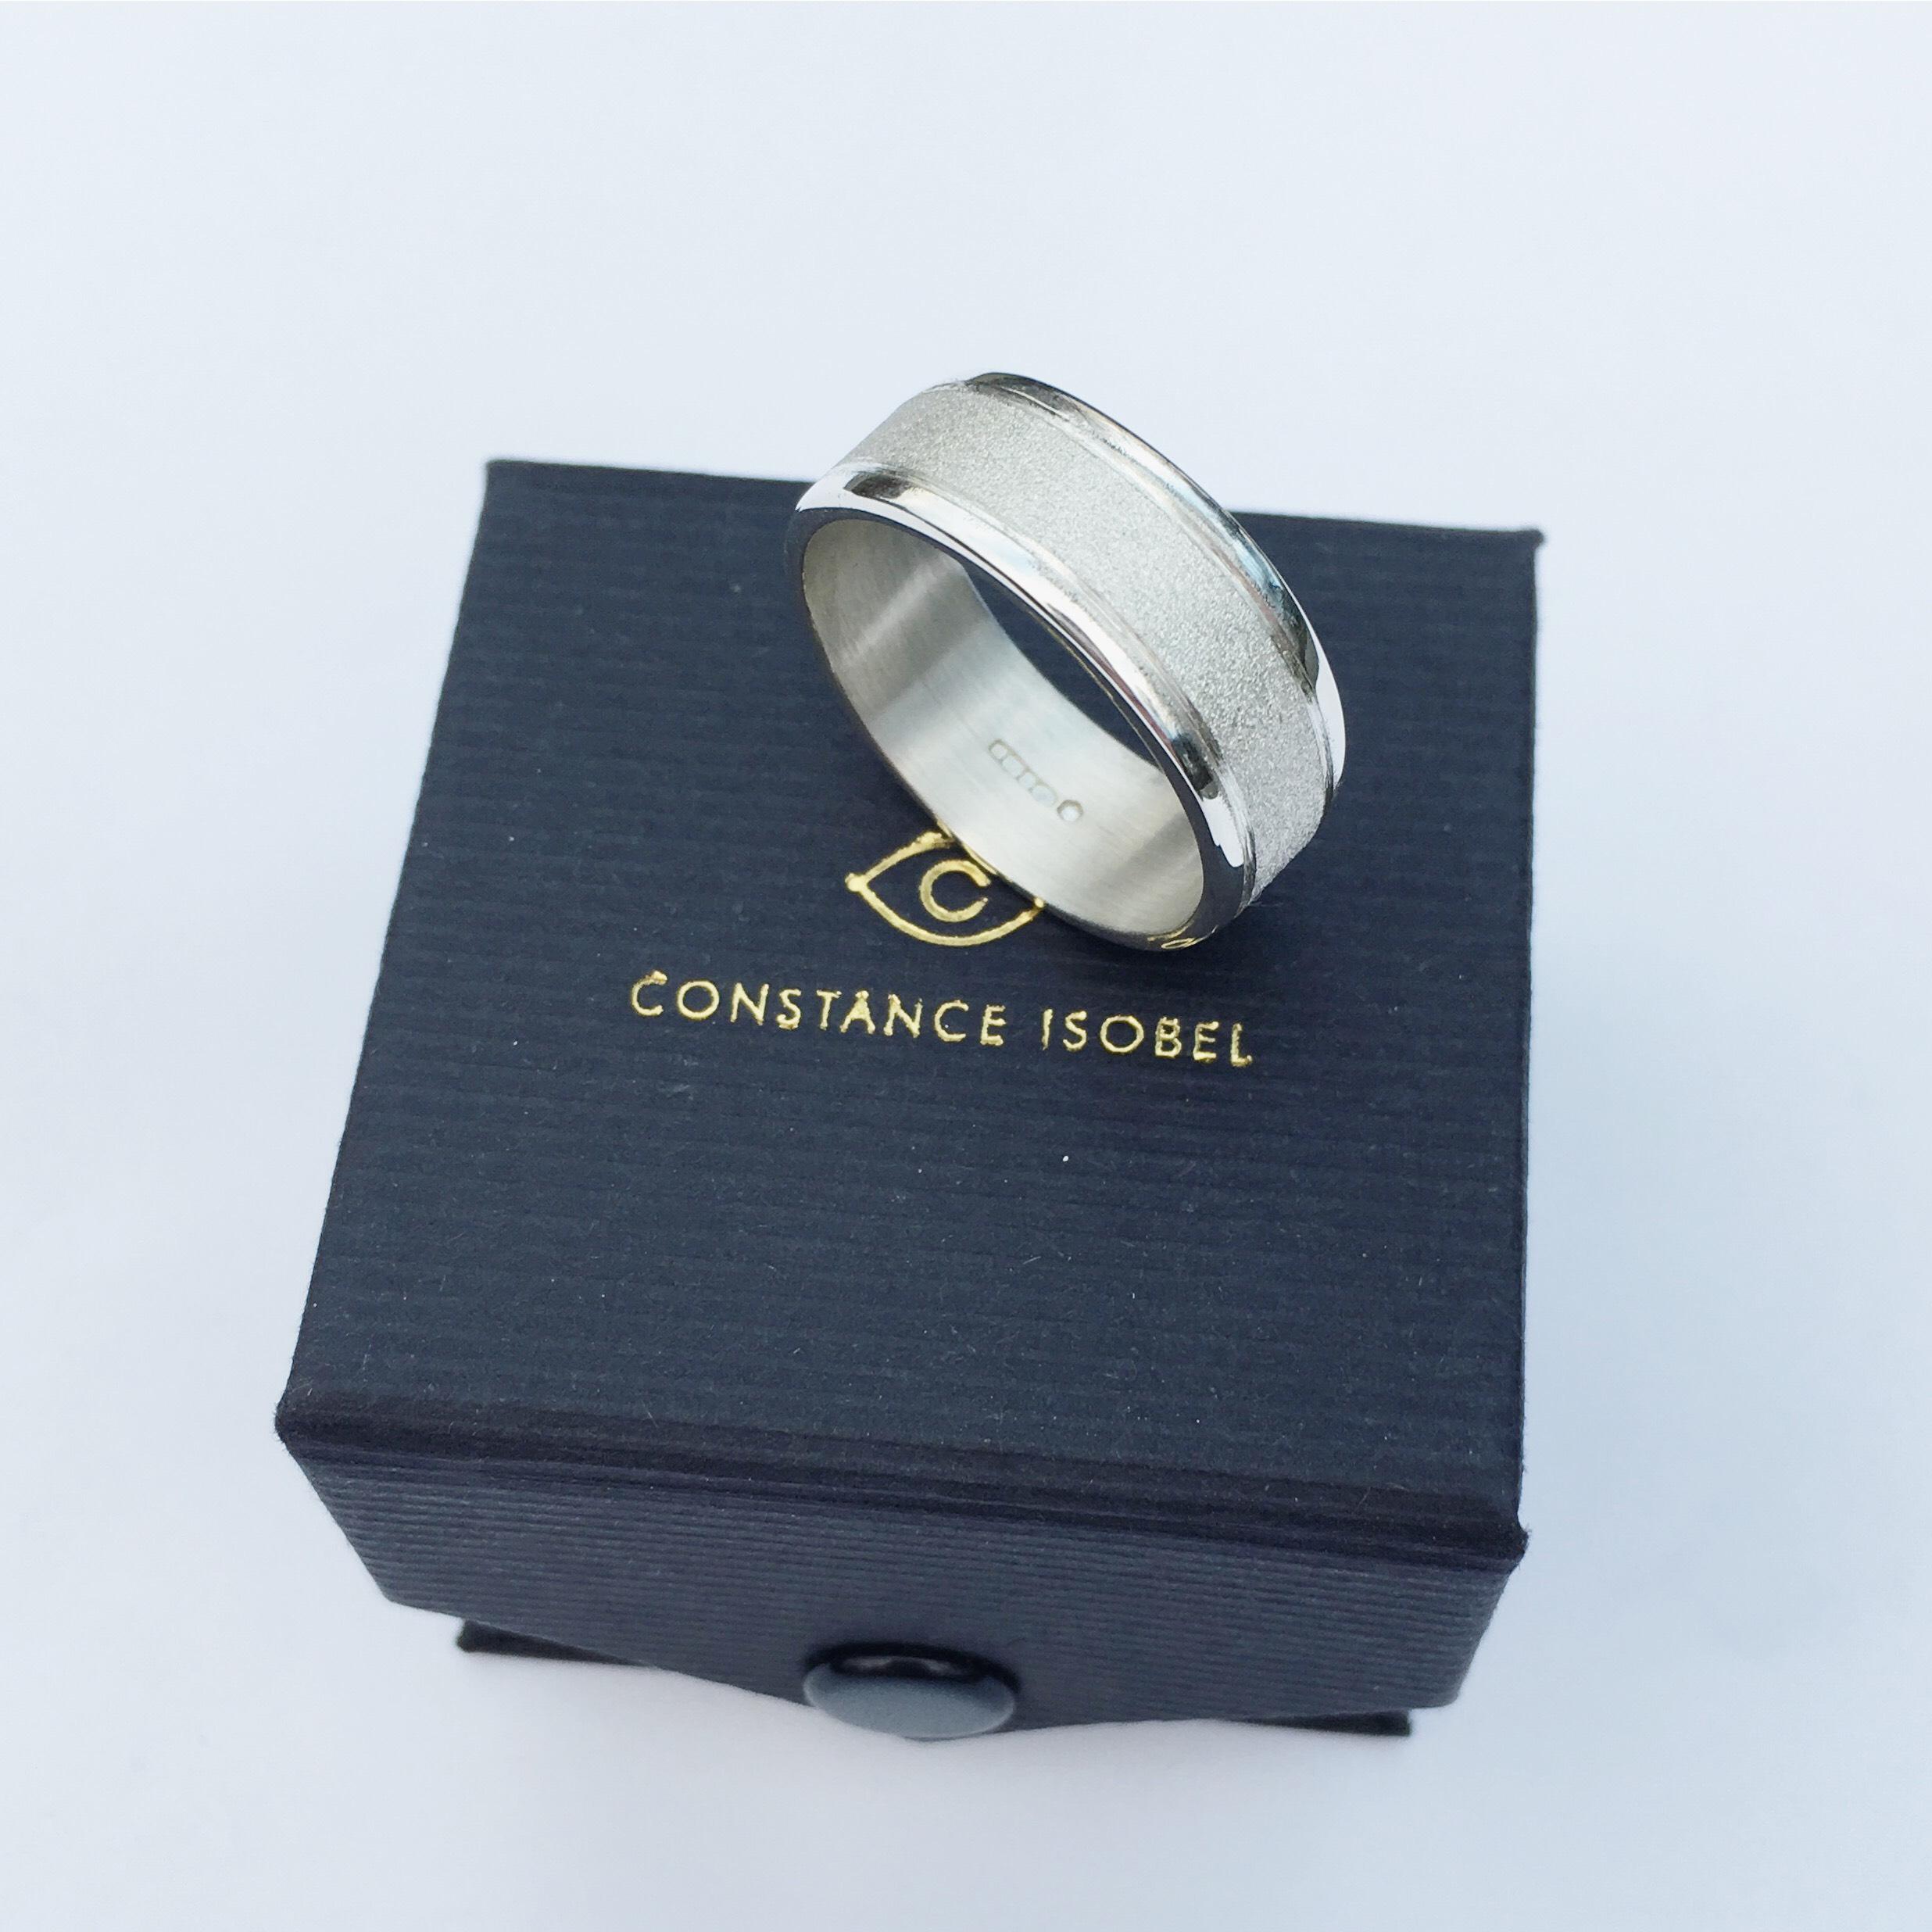 Constance Isobel. Silver Mens wedding ring.jpeg